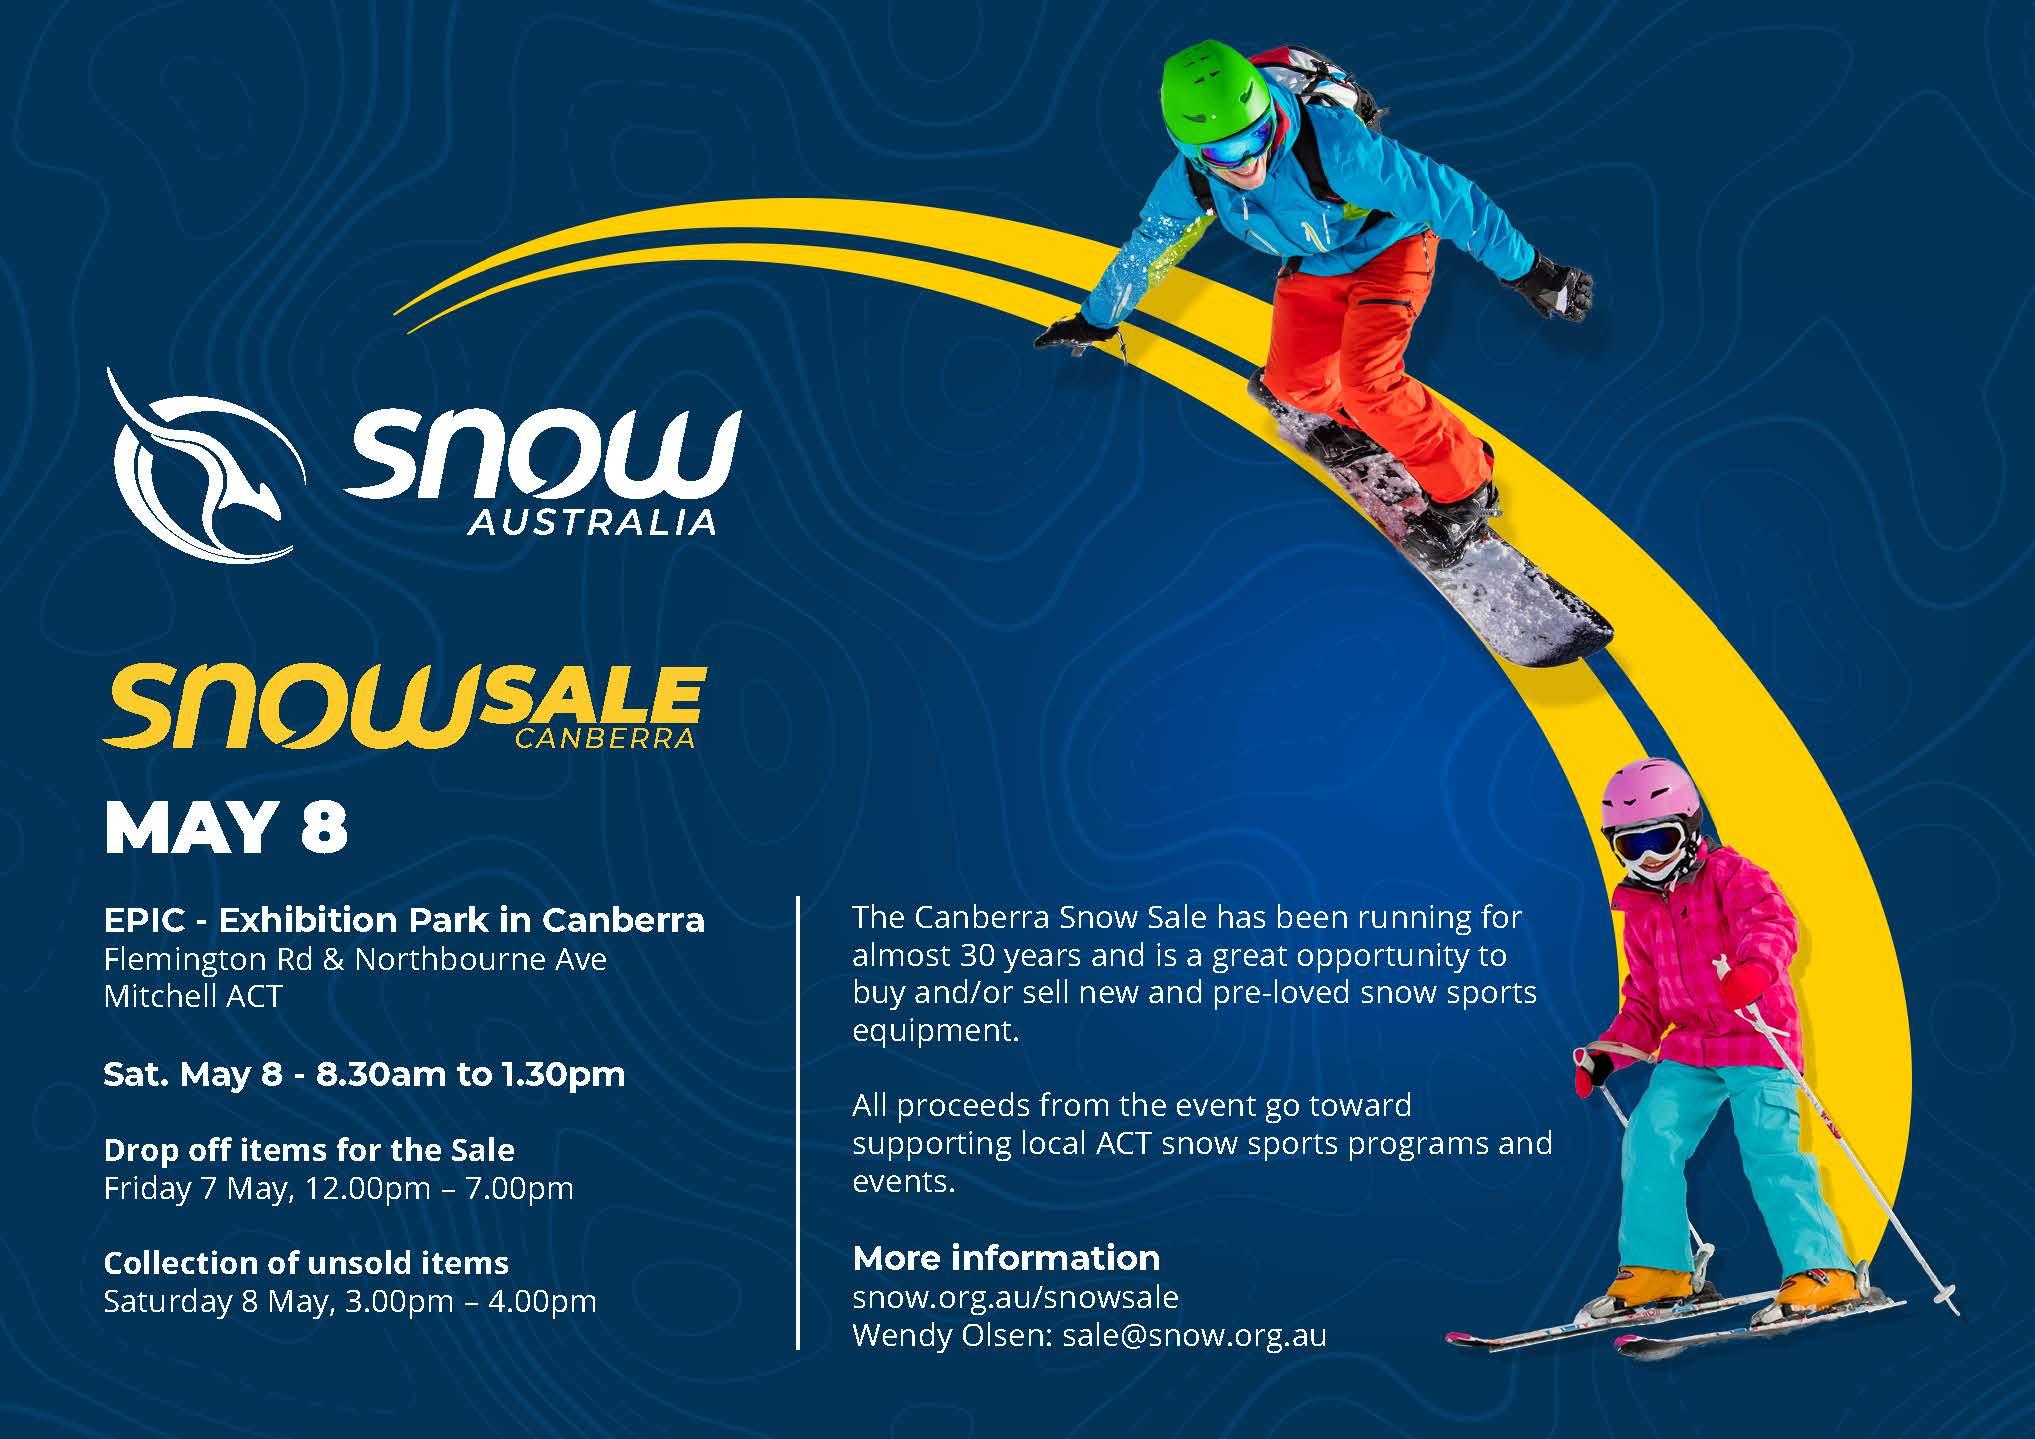 Snow Sale Canberra 2021